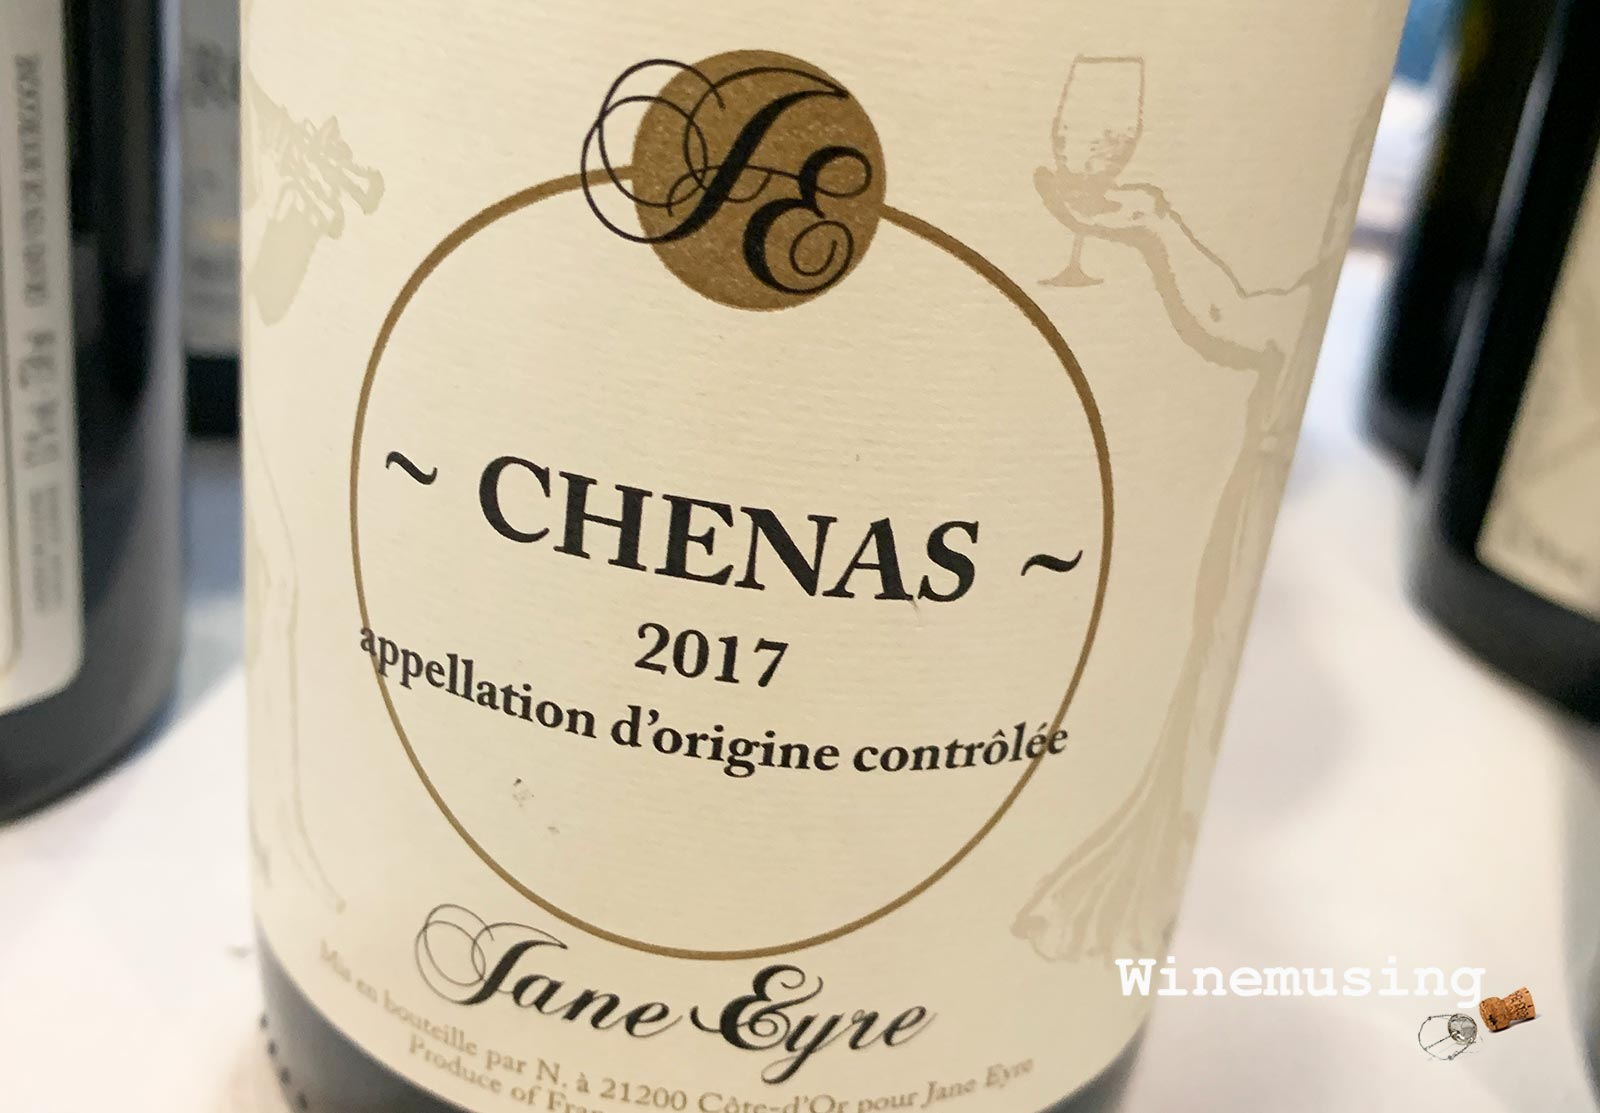 Jane Eyre Wines Chenas